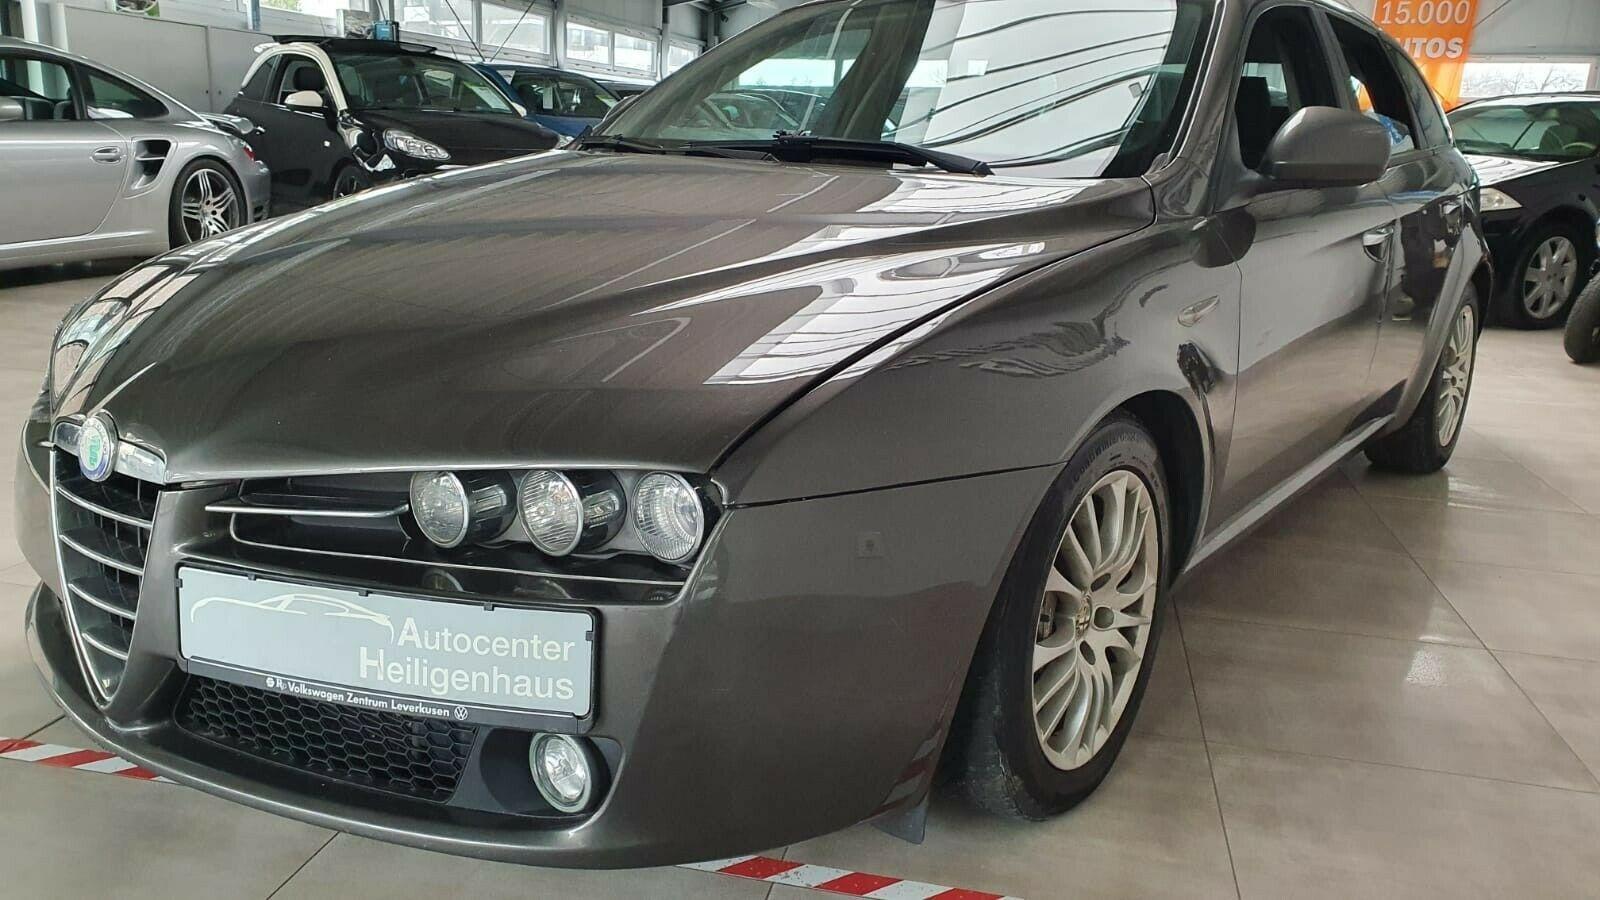 ALFA ROMEO Alfa 159 1.9 JTDM 16V Klimaautomatik Alu Winter